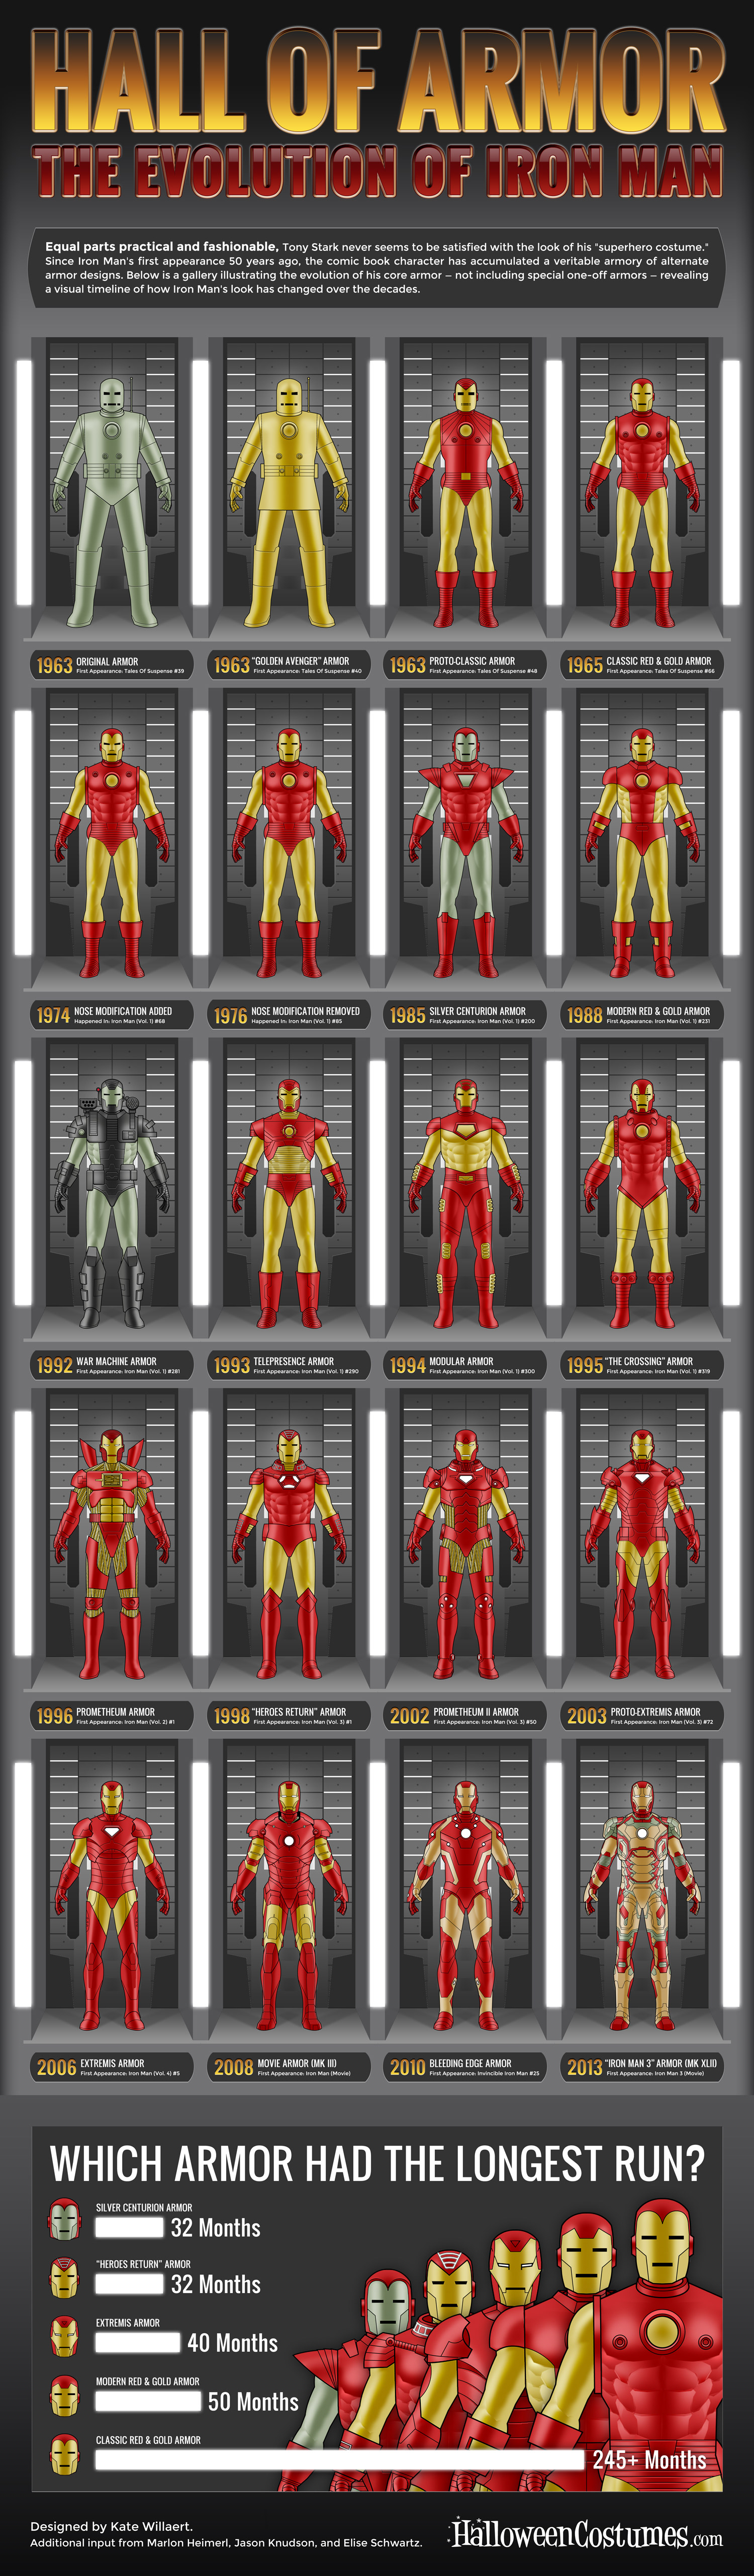 hall-of-armor-the-evolution-of-iron-man_51827e3fb828f